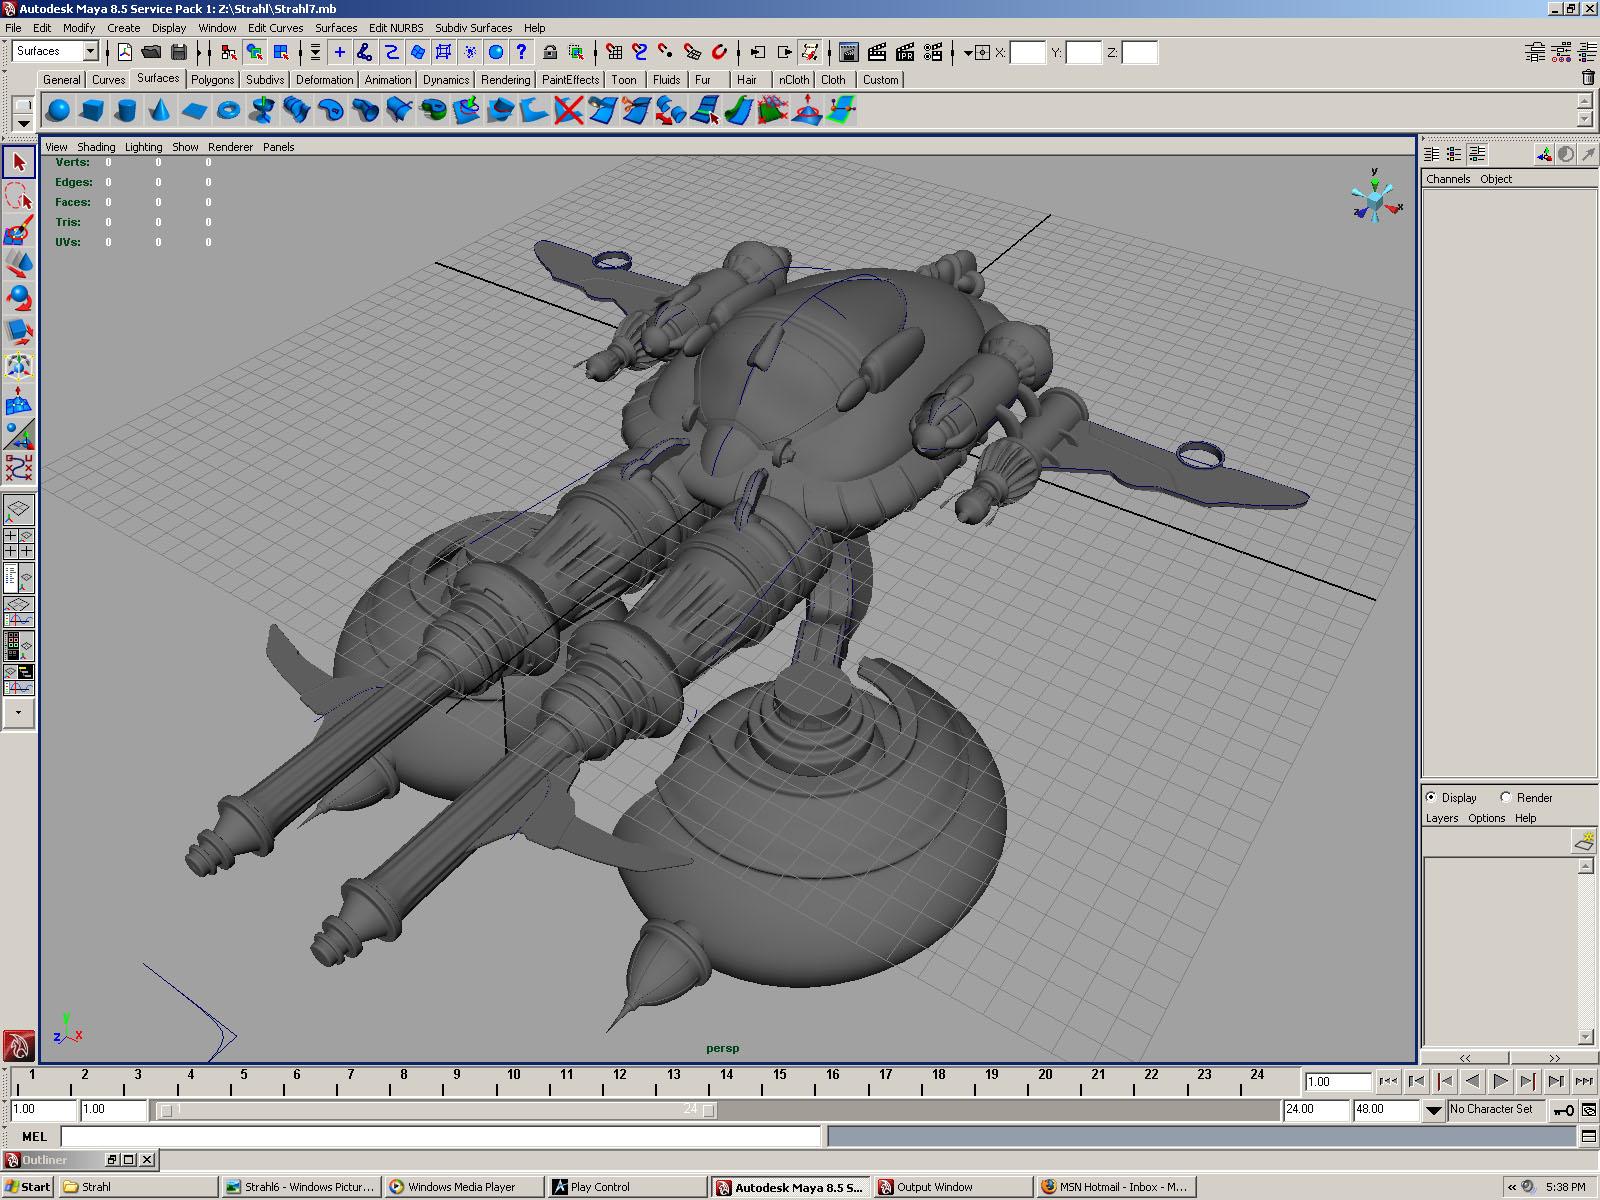 Balthier's Strahl - WIP by LynxGriffin